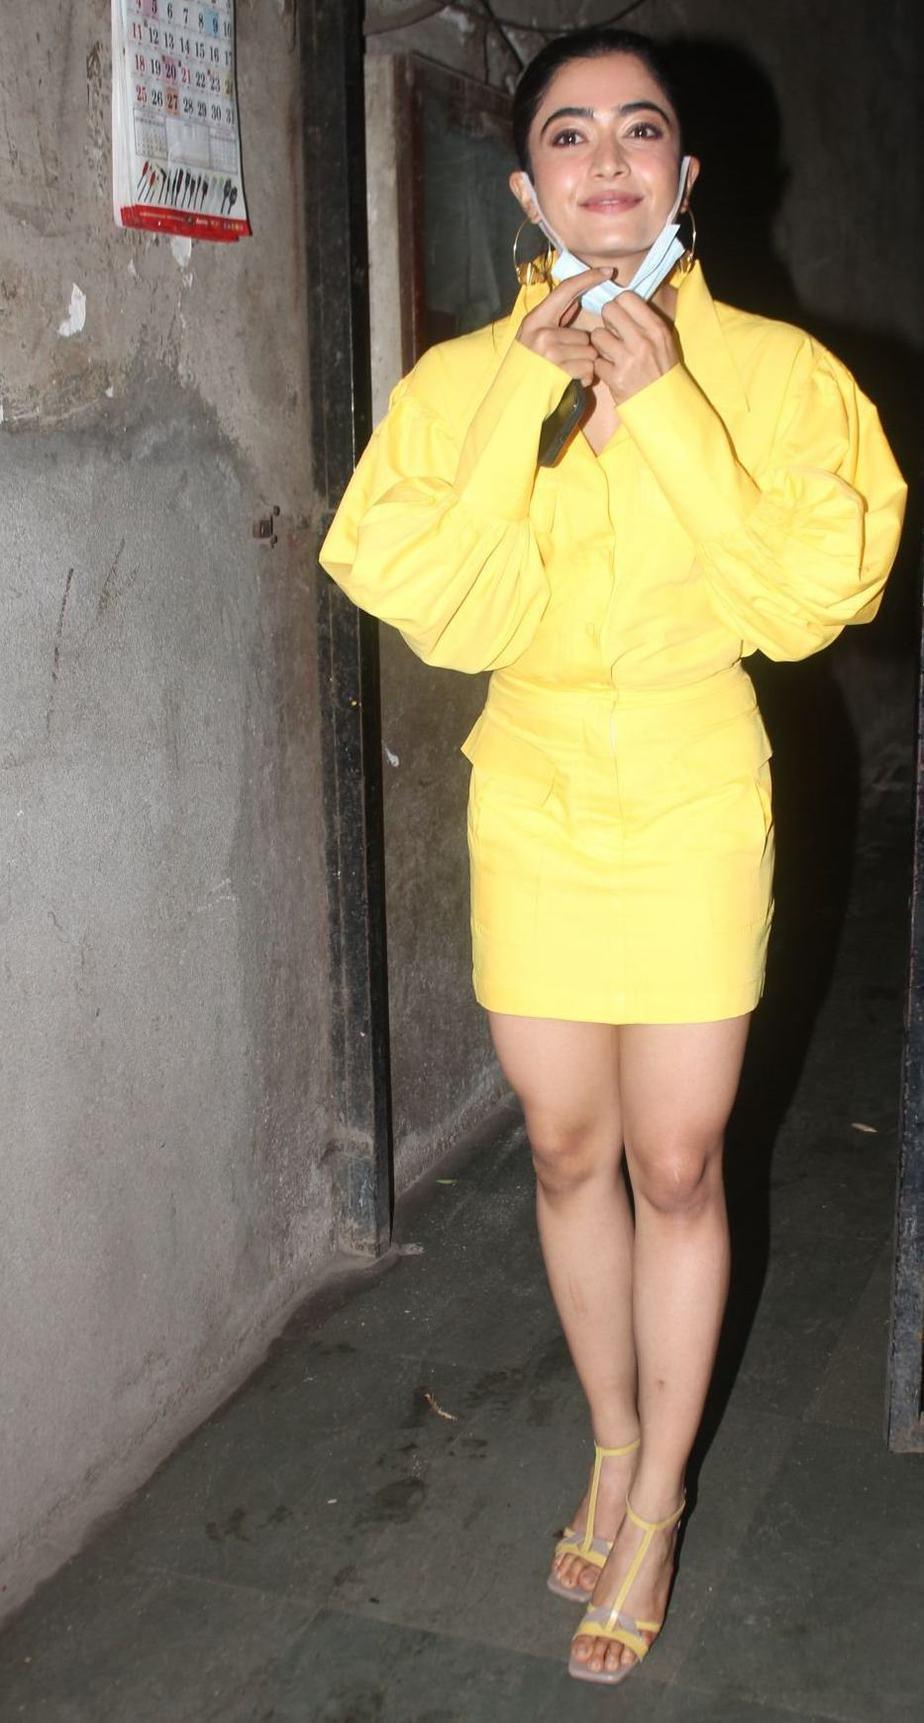 Rashmika Mandanna in yellow shirt mini skirt at monochrome studios-1